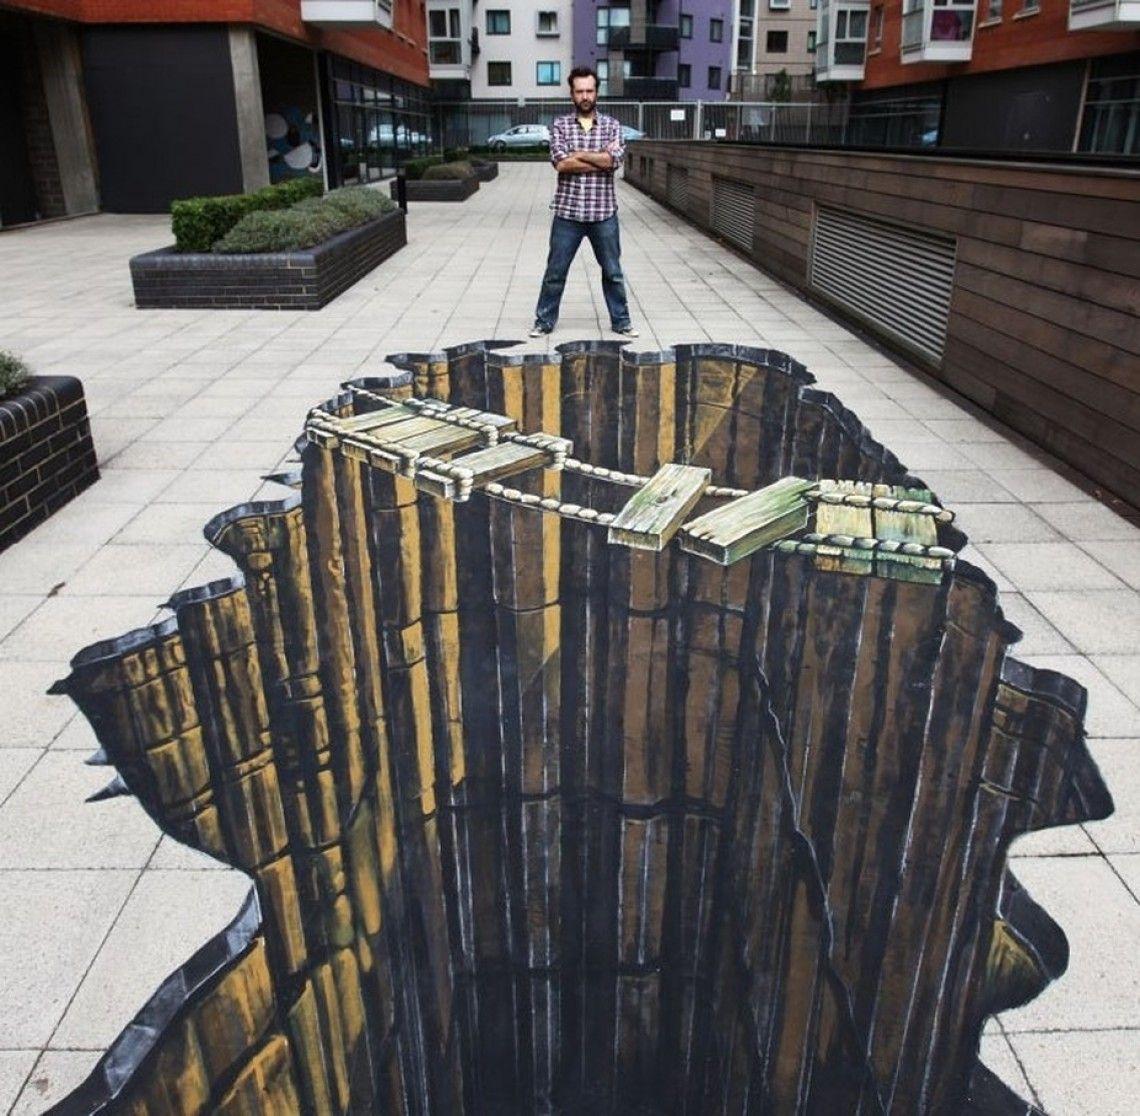 10 Pictures Of 10D Street Art To Make You Dizzy  Art de trottoir